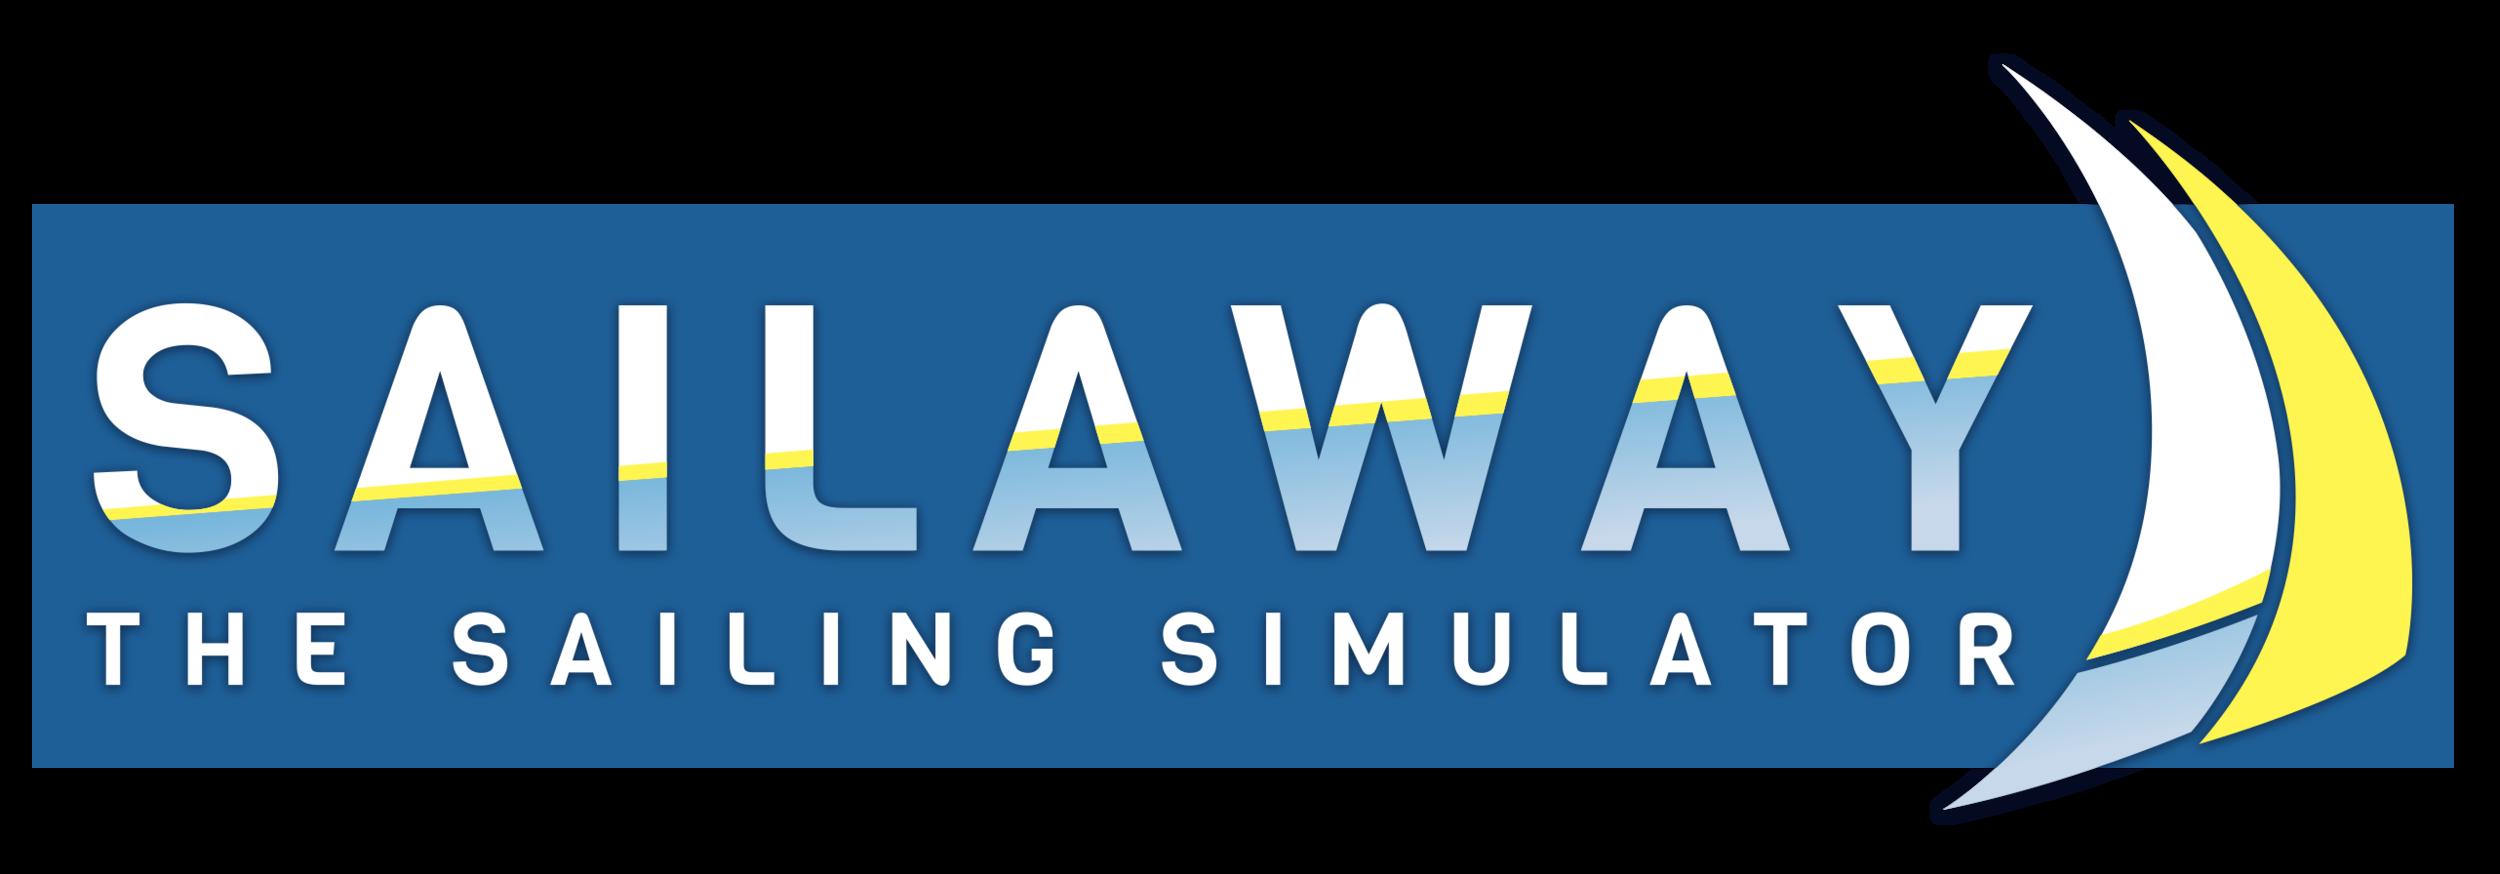 Sailaway_logo2_bg.png